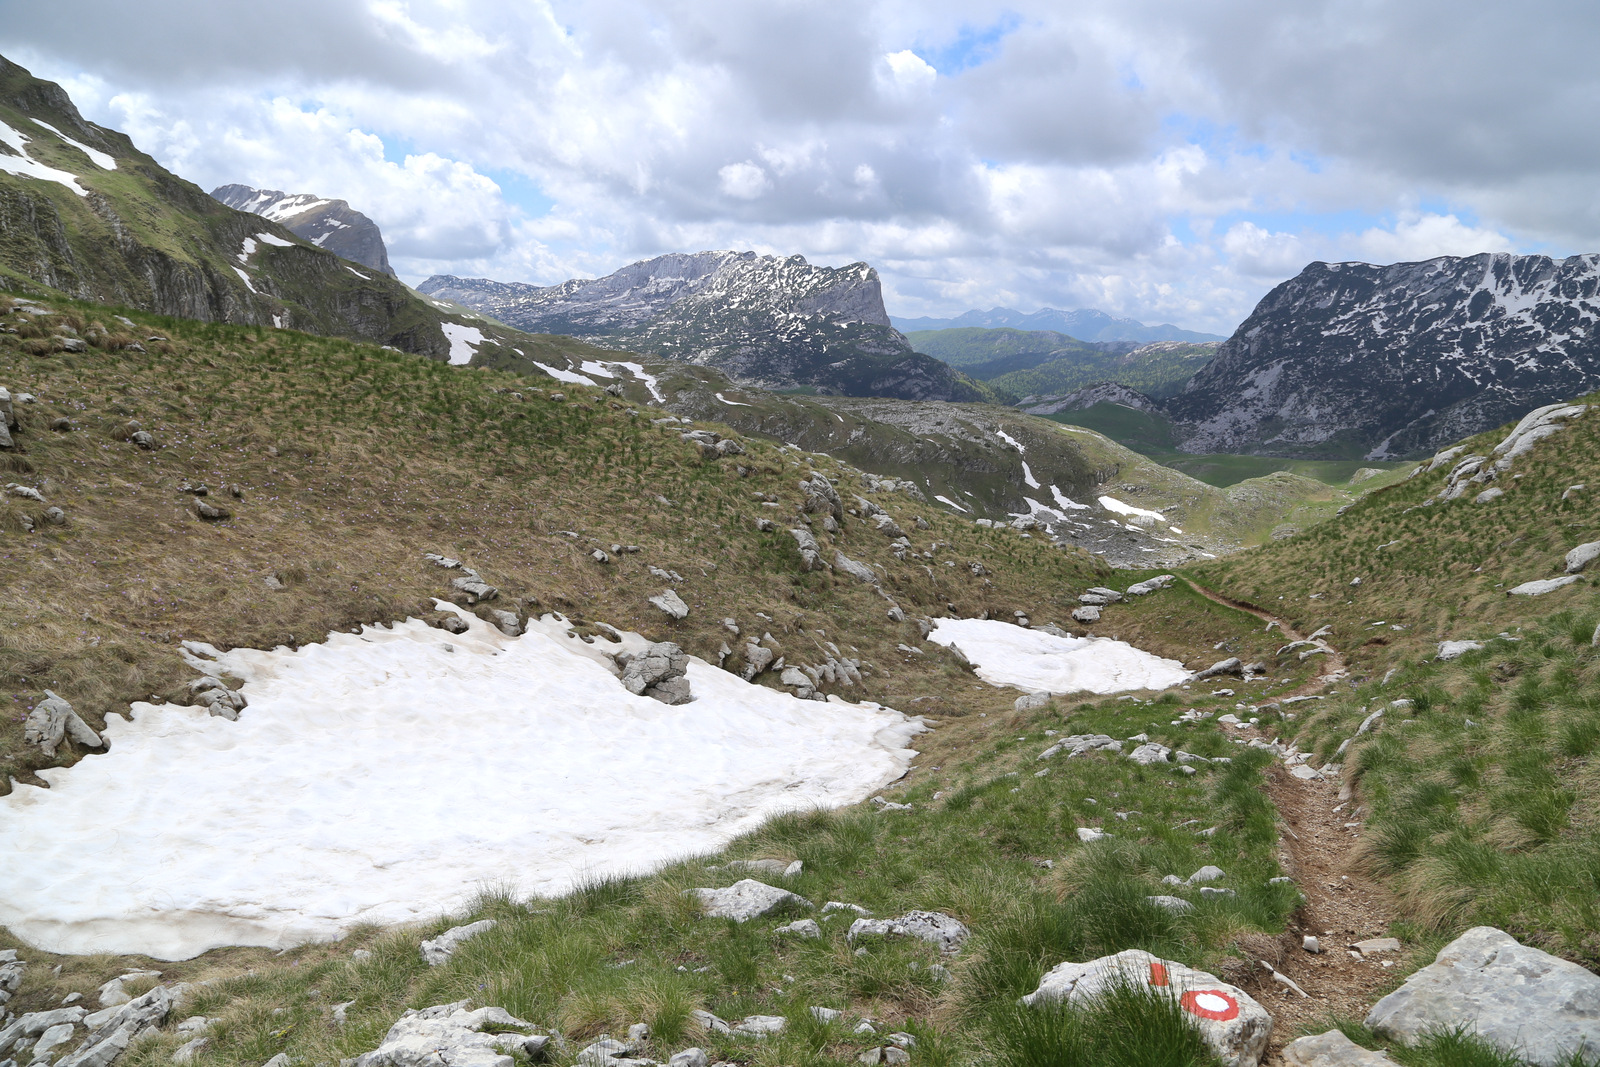 Route to Skrcka lakes